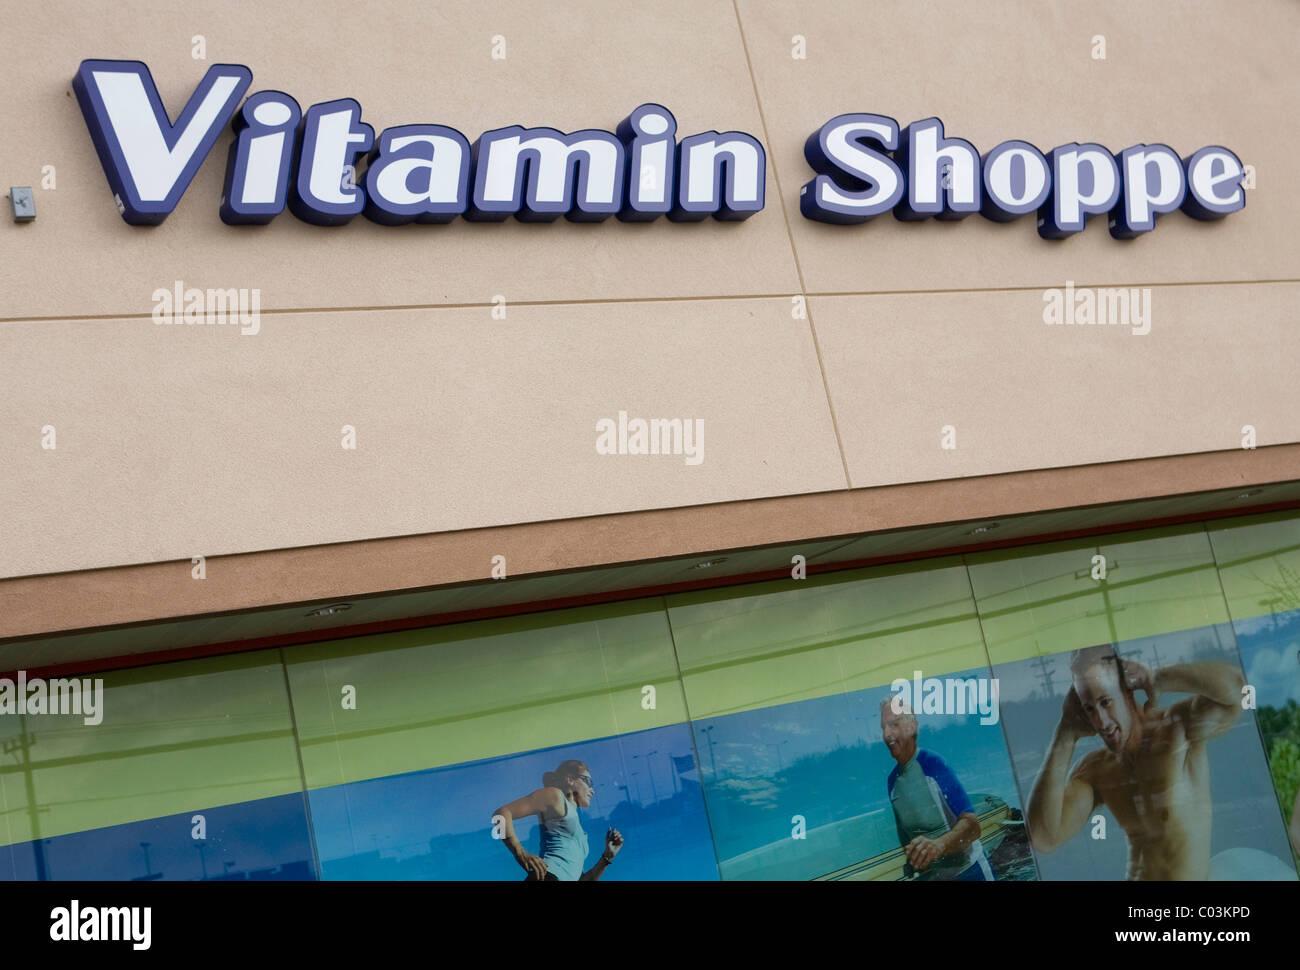 Ladengeschäft Vitamin Shoppe. Stockbild